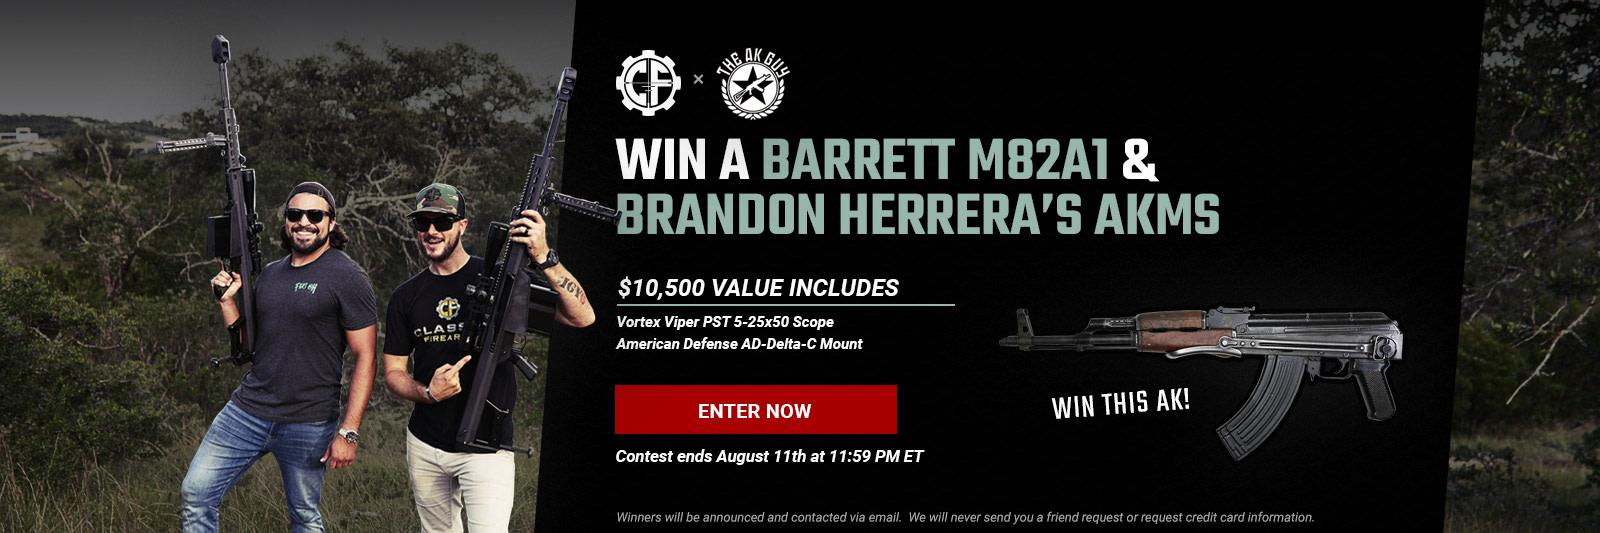 ENTER TO WIN A BARRETT M82A1 AND BRANDON HERRERA'S AKMS